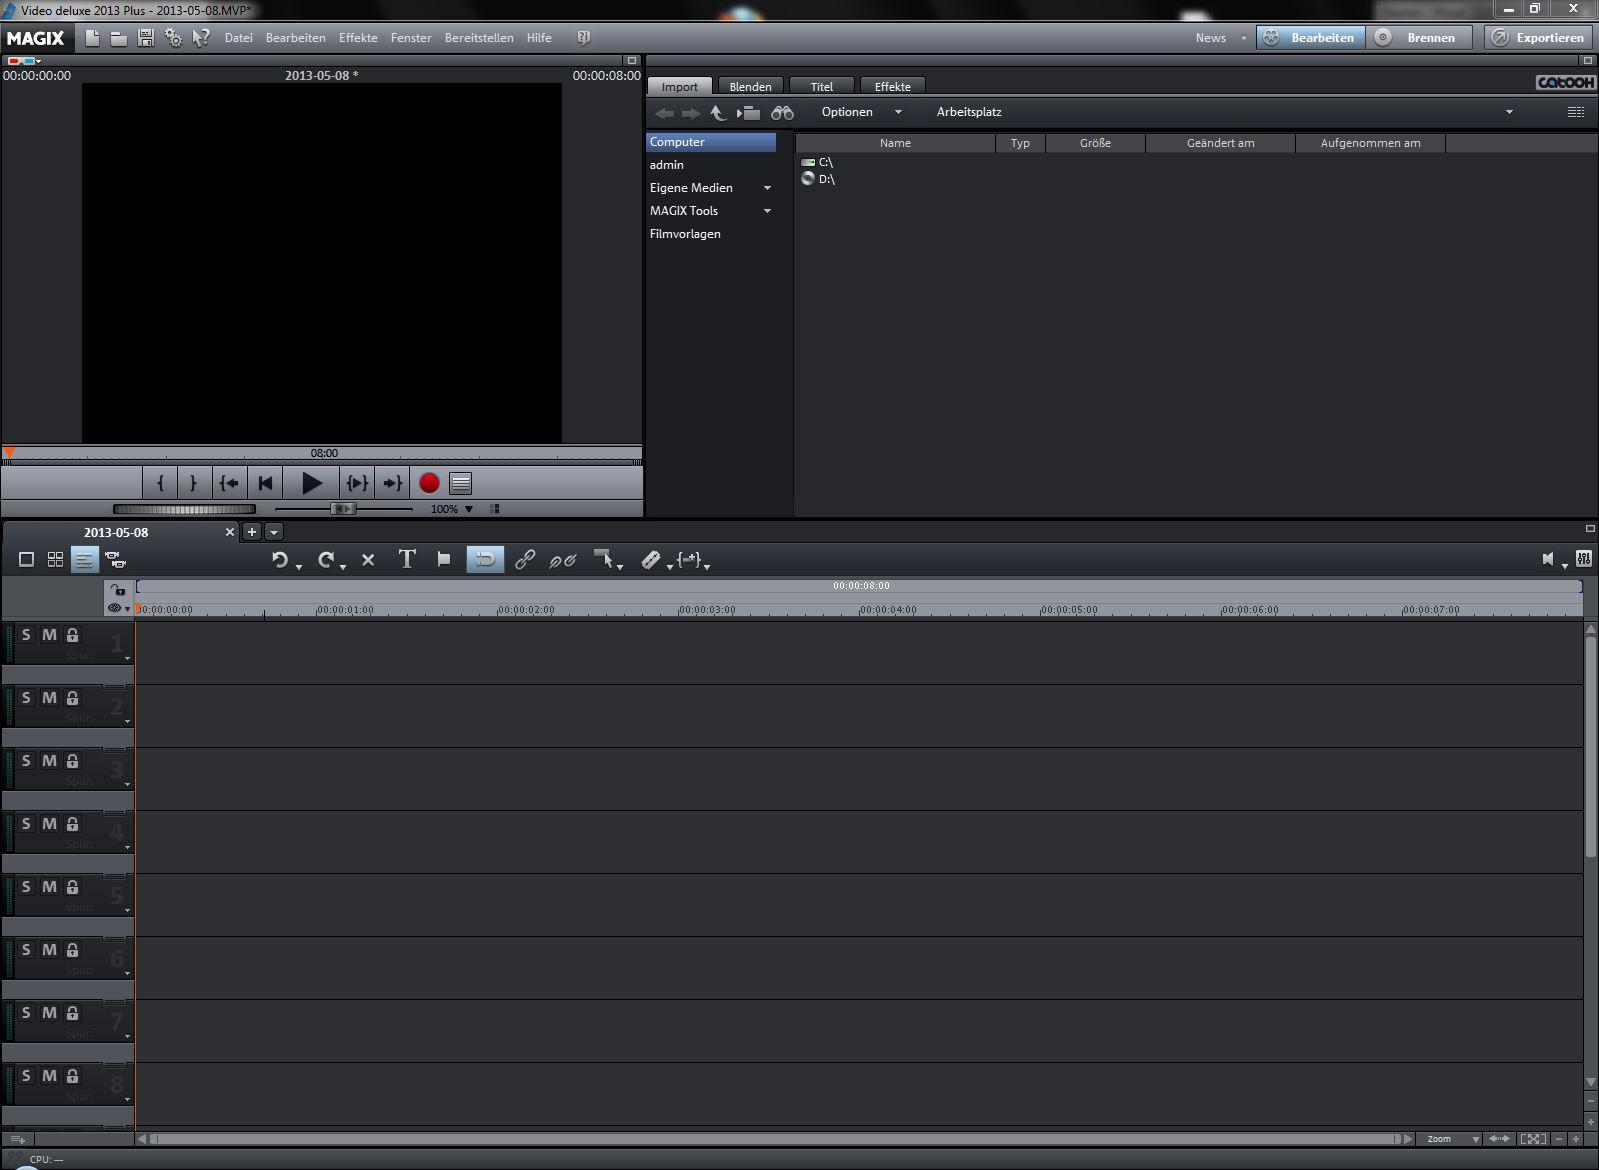 Video Deluxe 2013 Benutzoberfläche